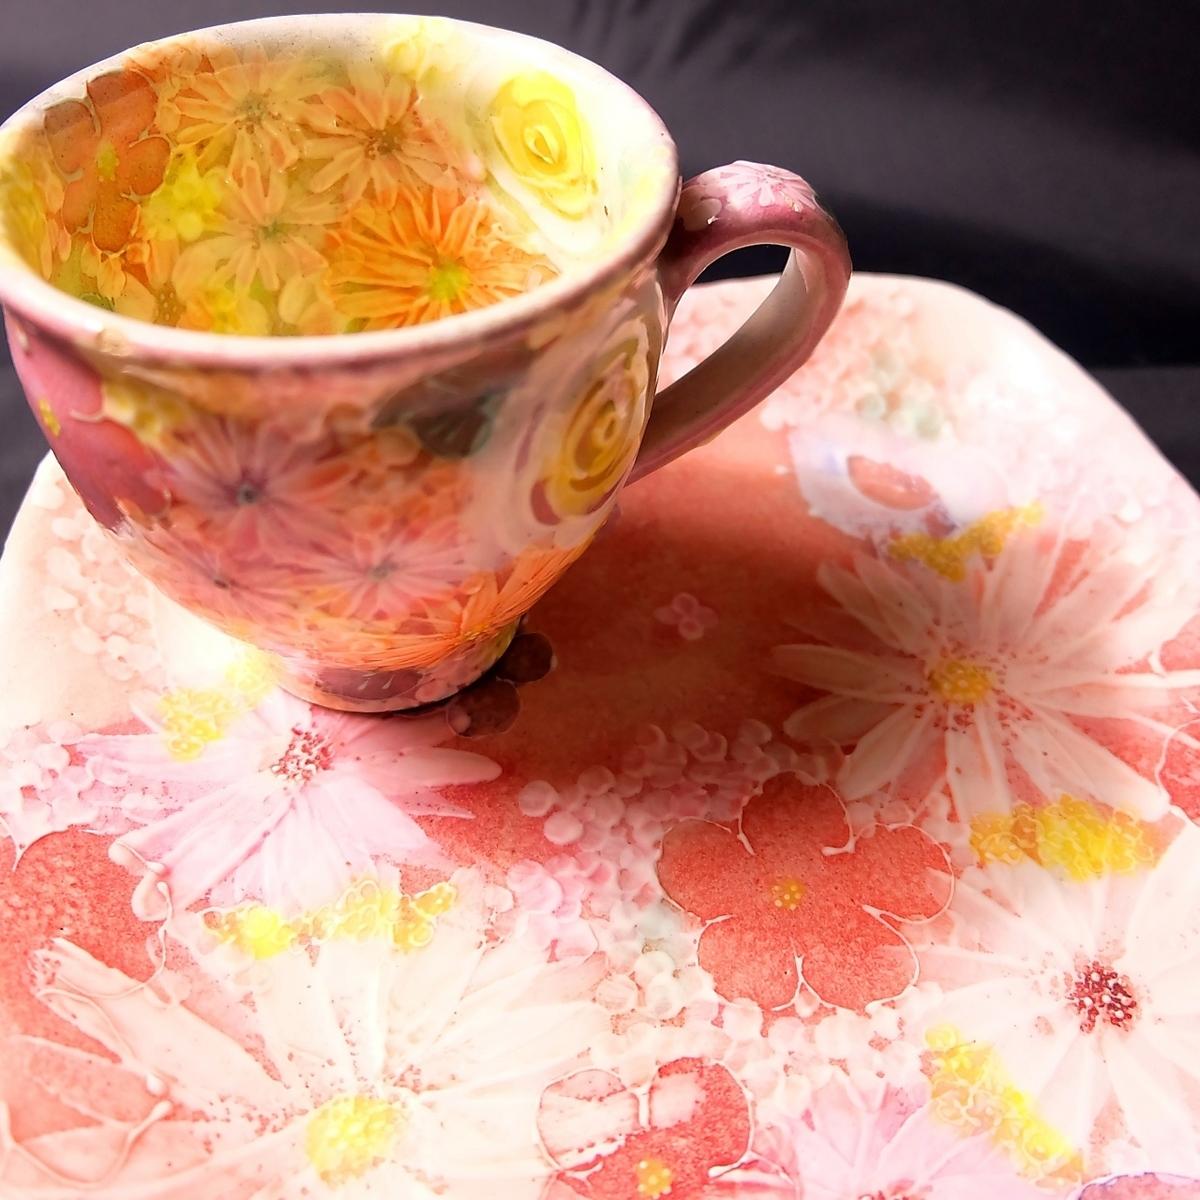 ♪ with dessert ♪ drinks that will also pleasantly enjoy Matsuko's bowls ♪